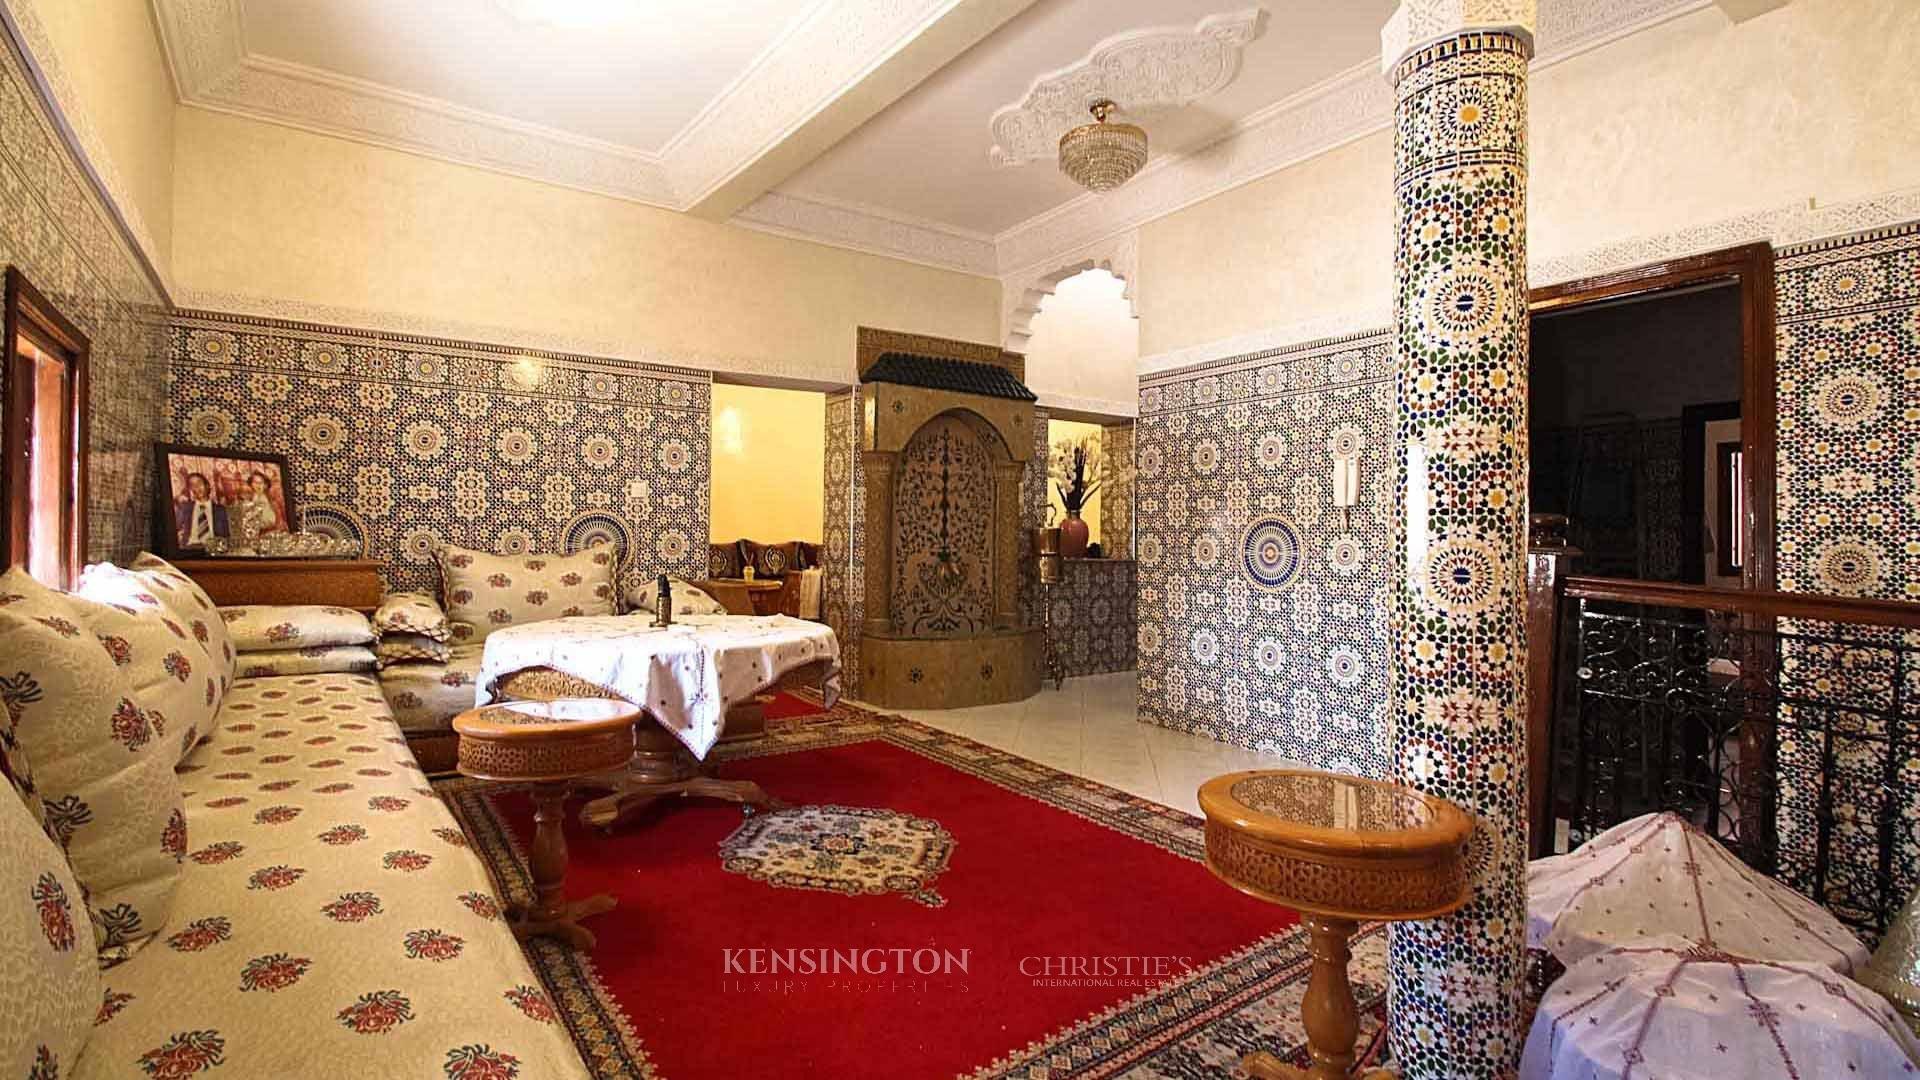 KPPM01069: Apartment Kennara Apartment Marrakech Morocco